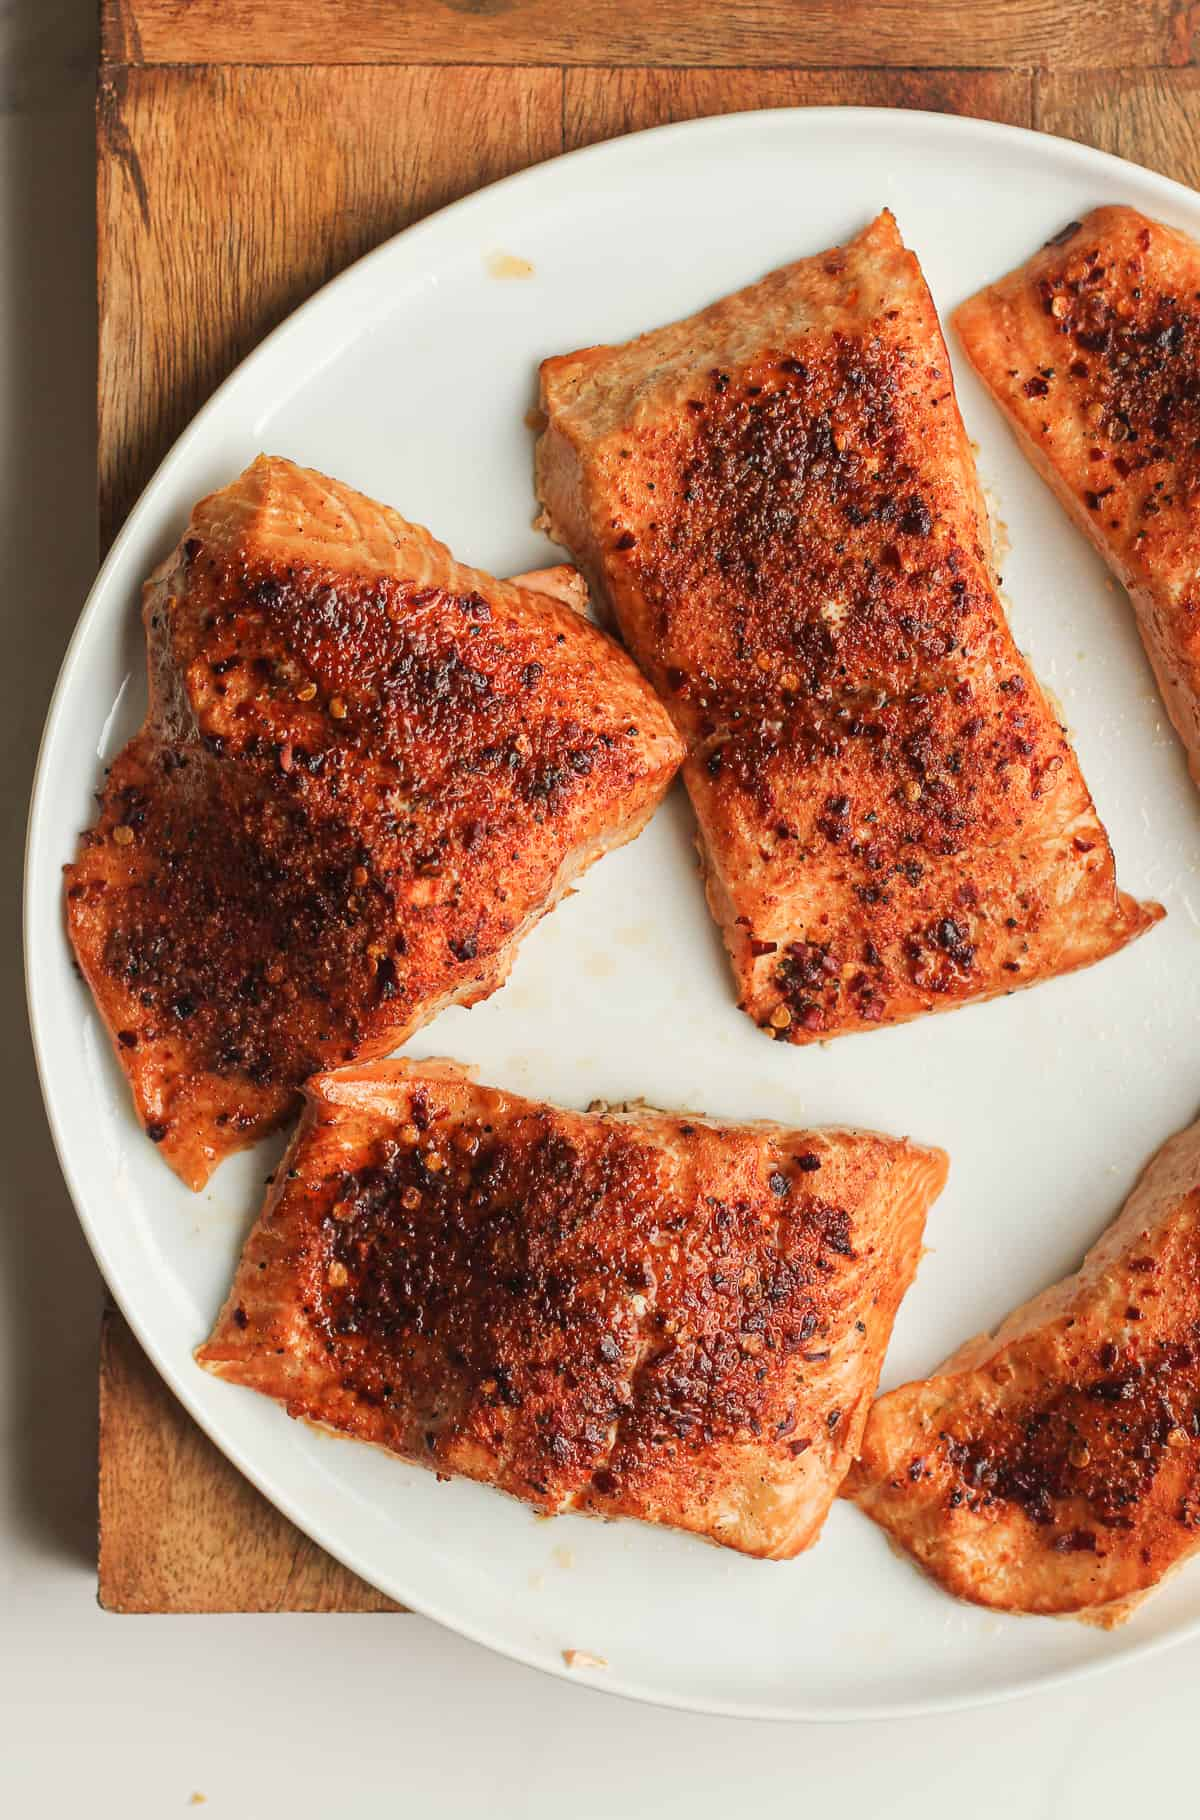 A plate of cedar plank salmon.